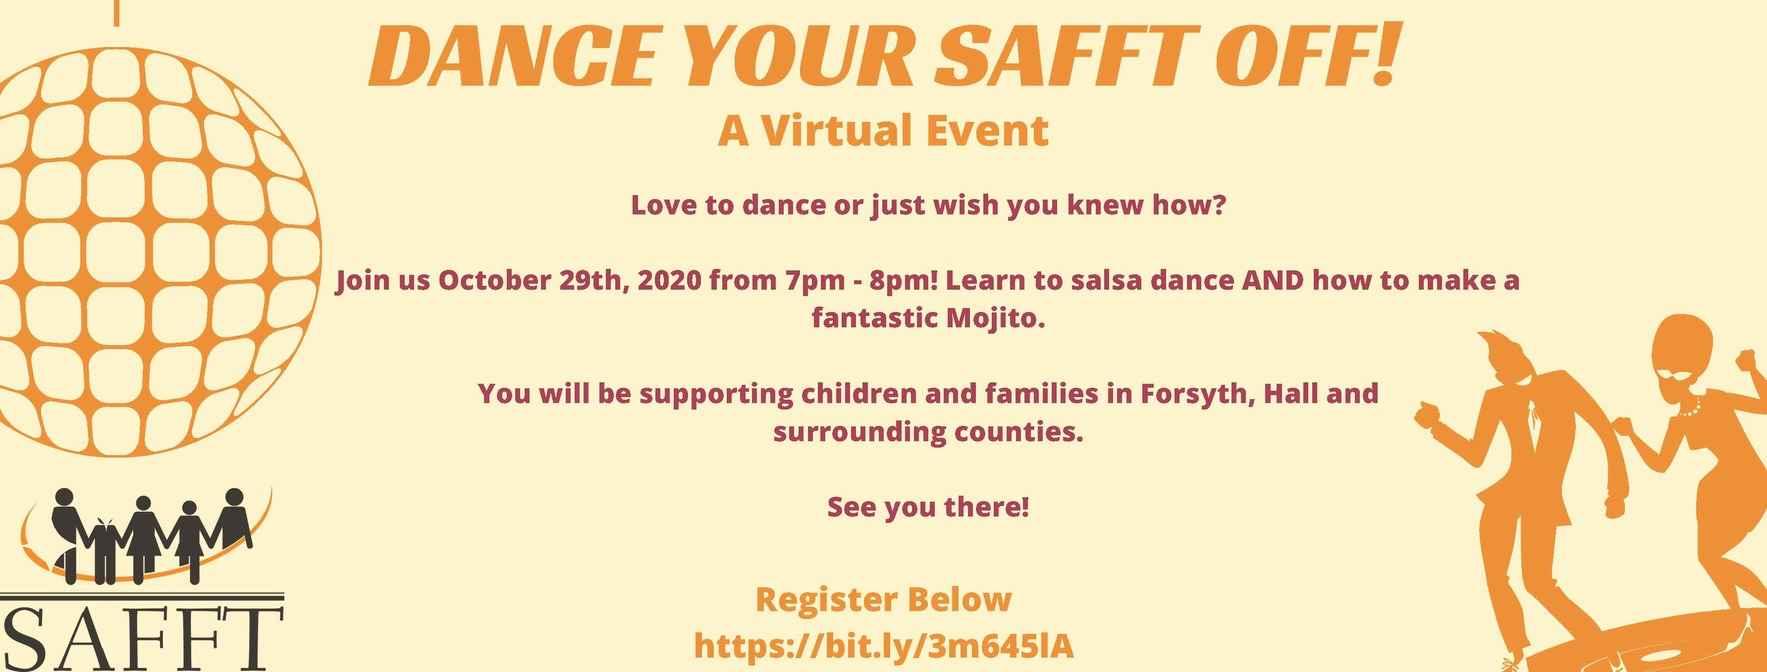 Dance Your SAFFT Off image